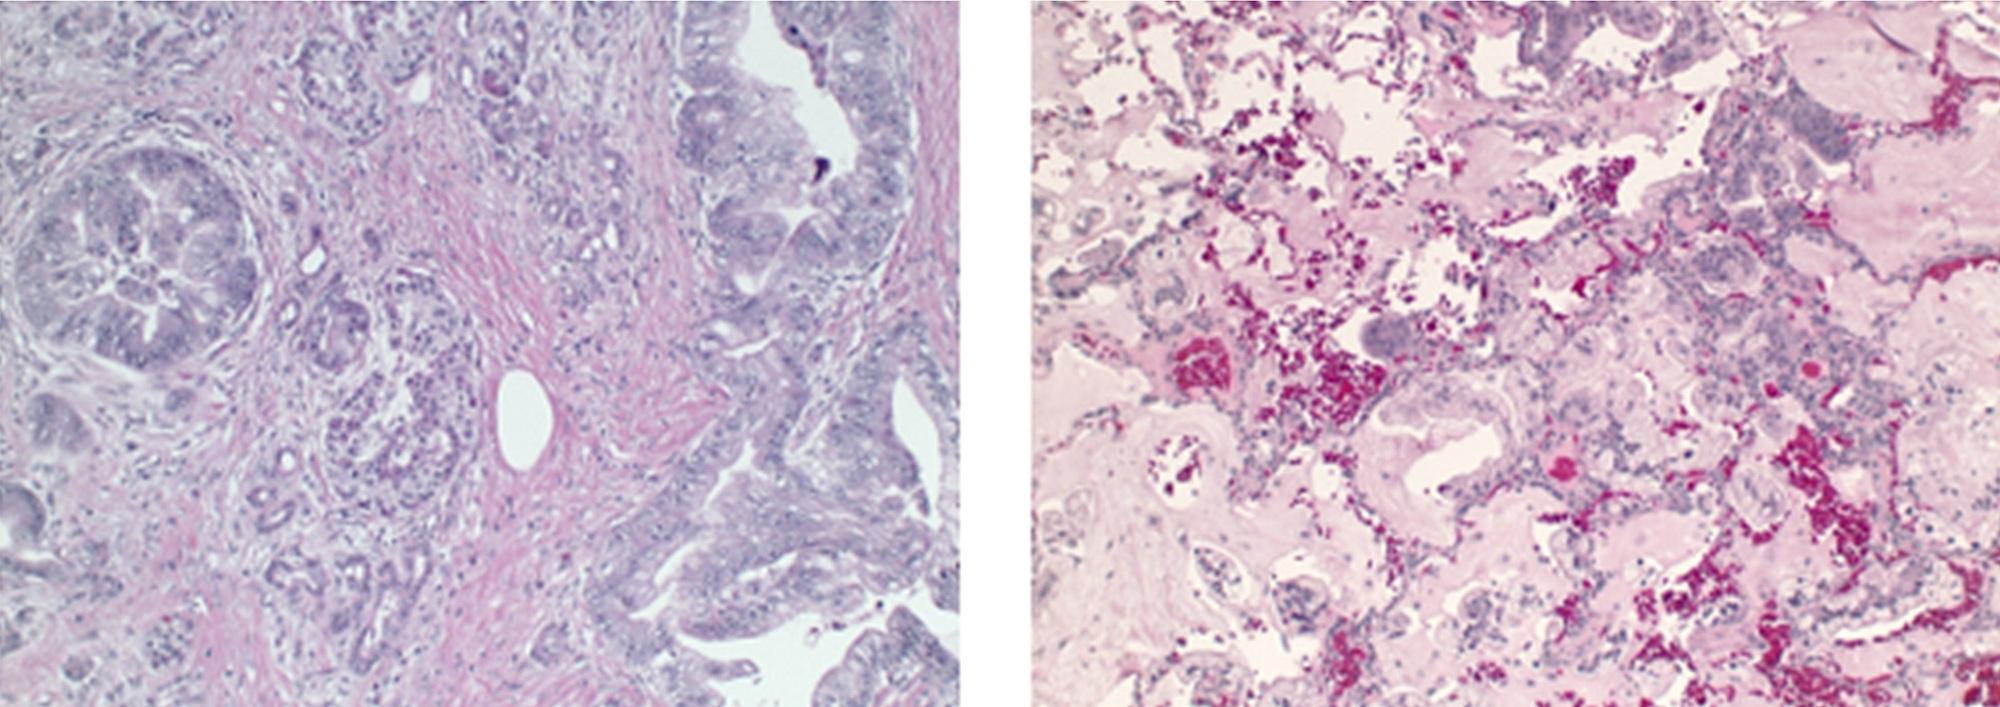 Cureus   A Long-Term Survivor of Metastatic Pancreatic